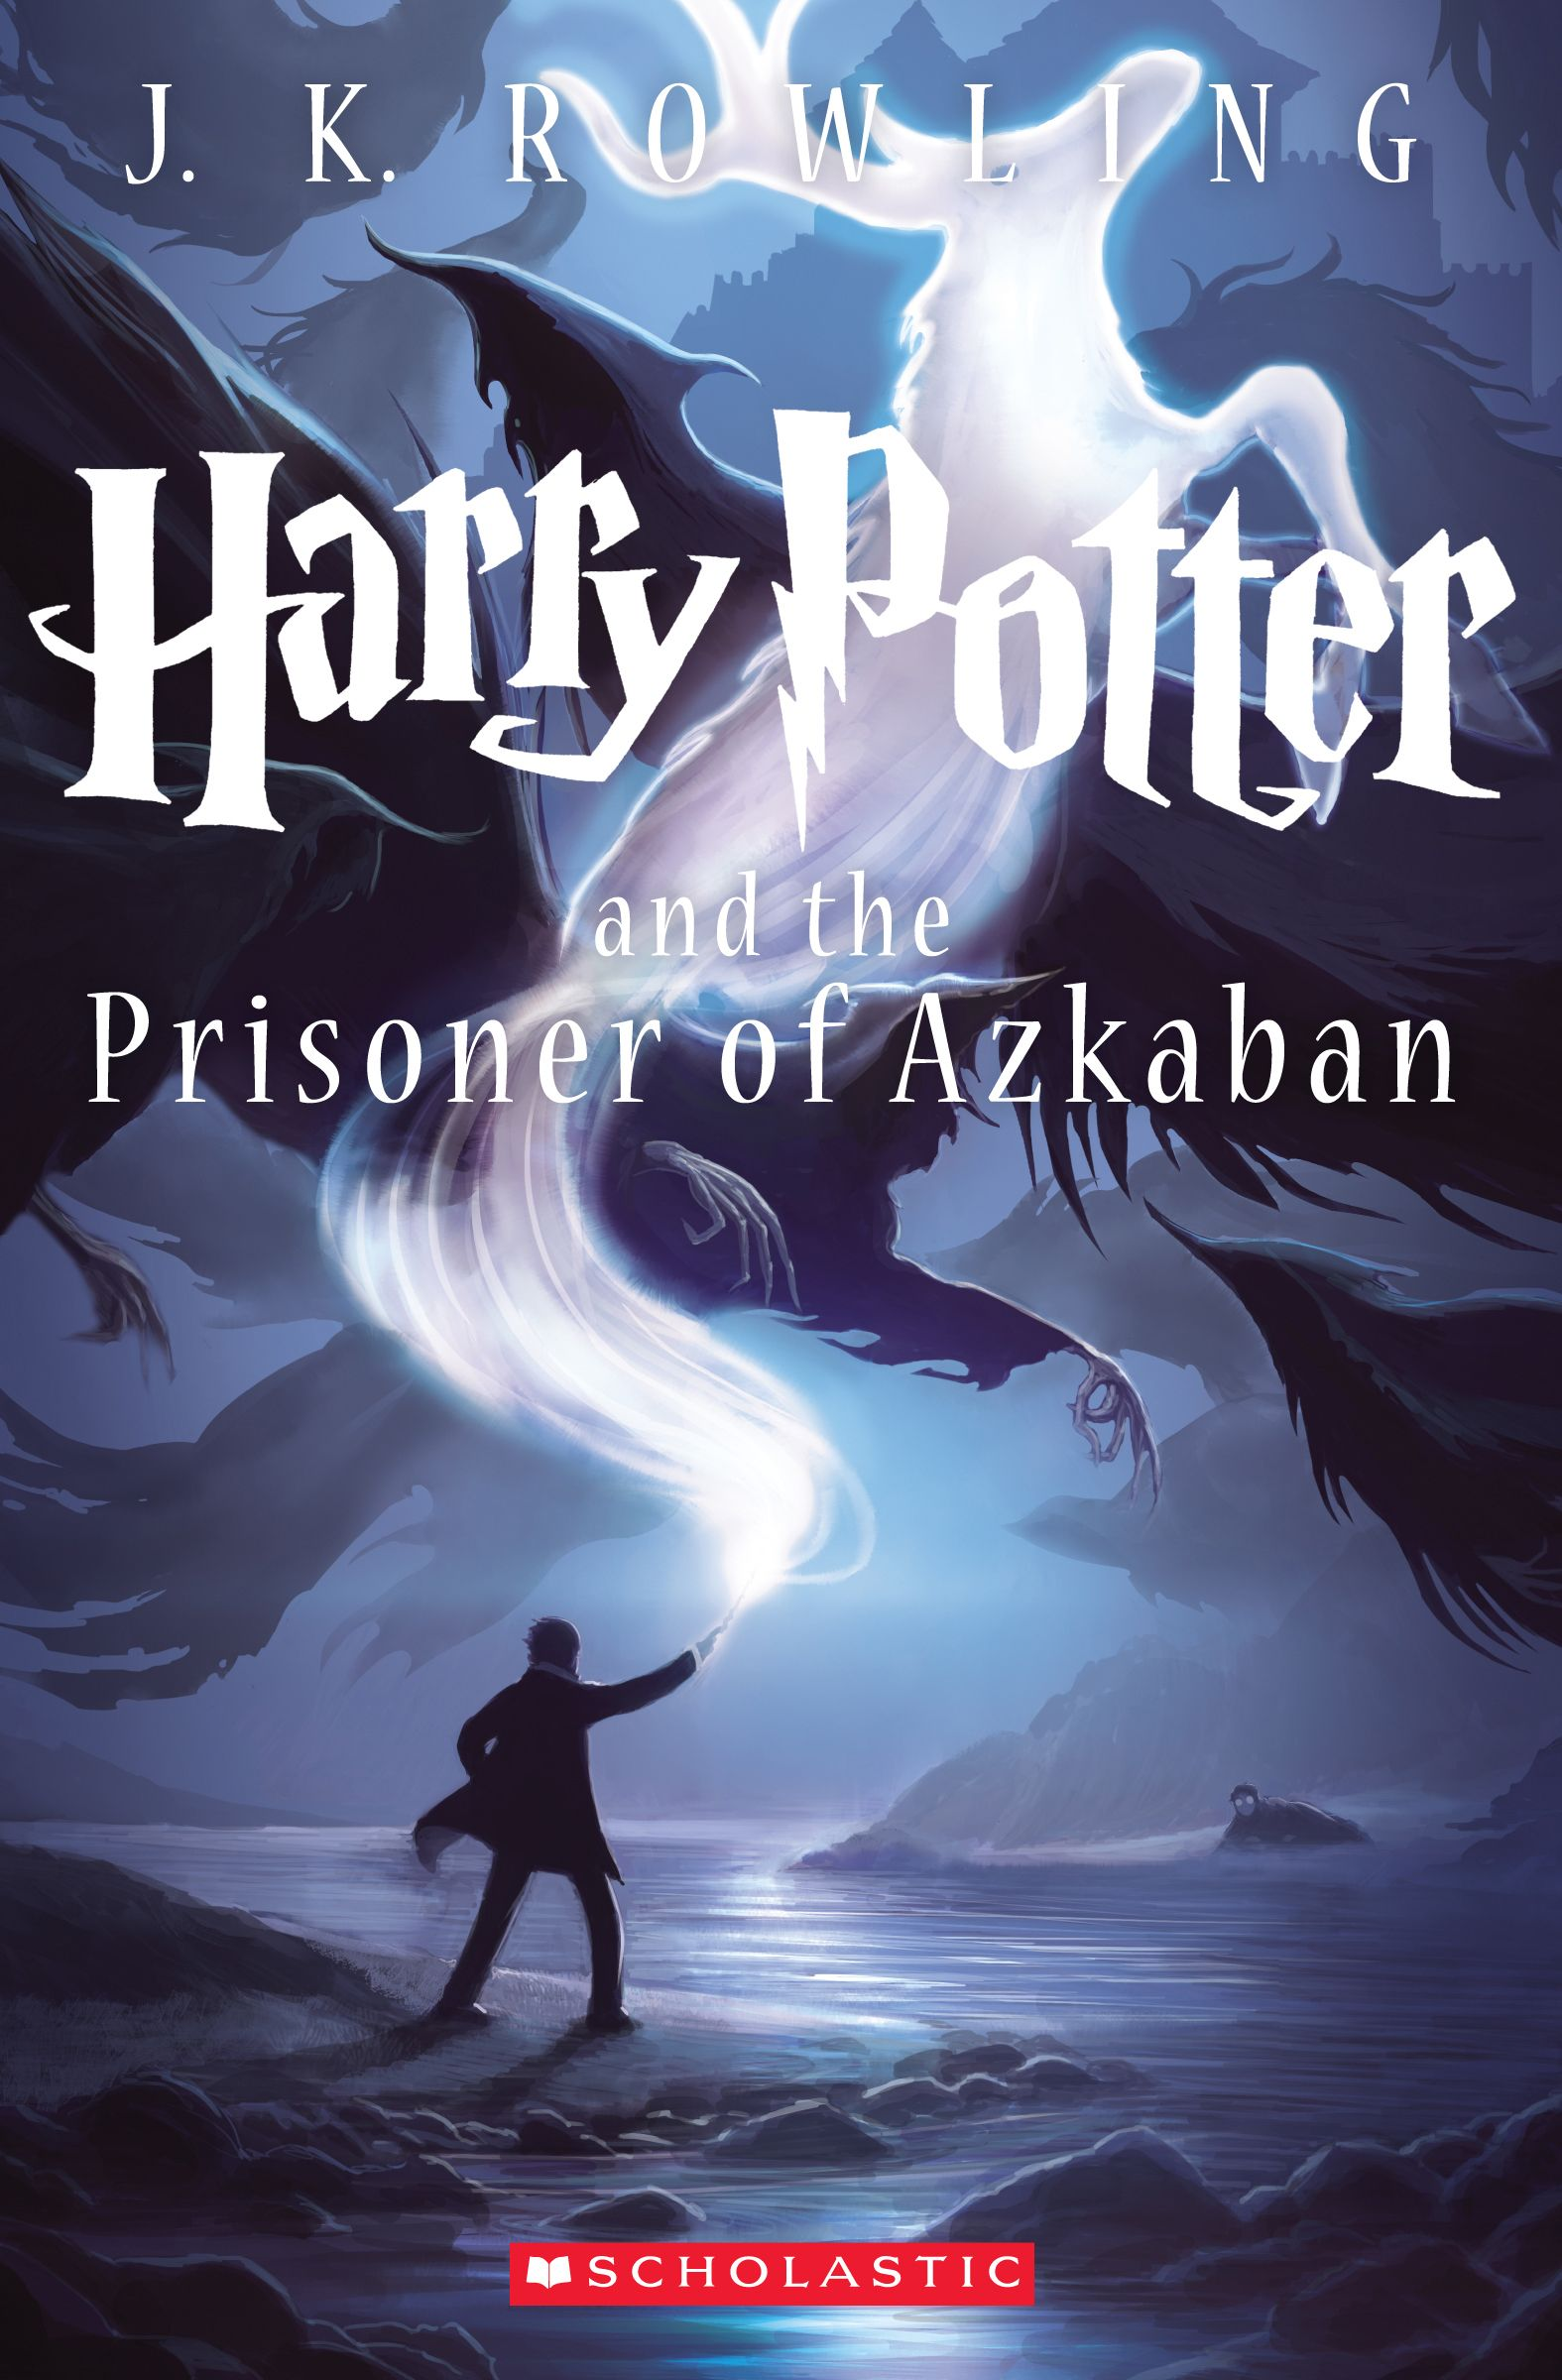 Harry Potter News New Harry Potter And The Prisoner Of Azkaban U S Book C Cubiertas De Libros De Harry Potter Libros De Harry Potter Prisionero De Azkaban